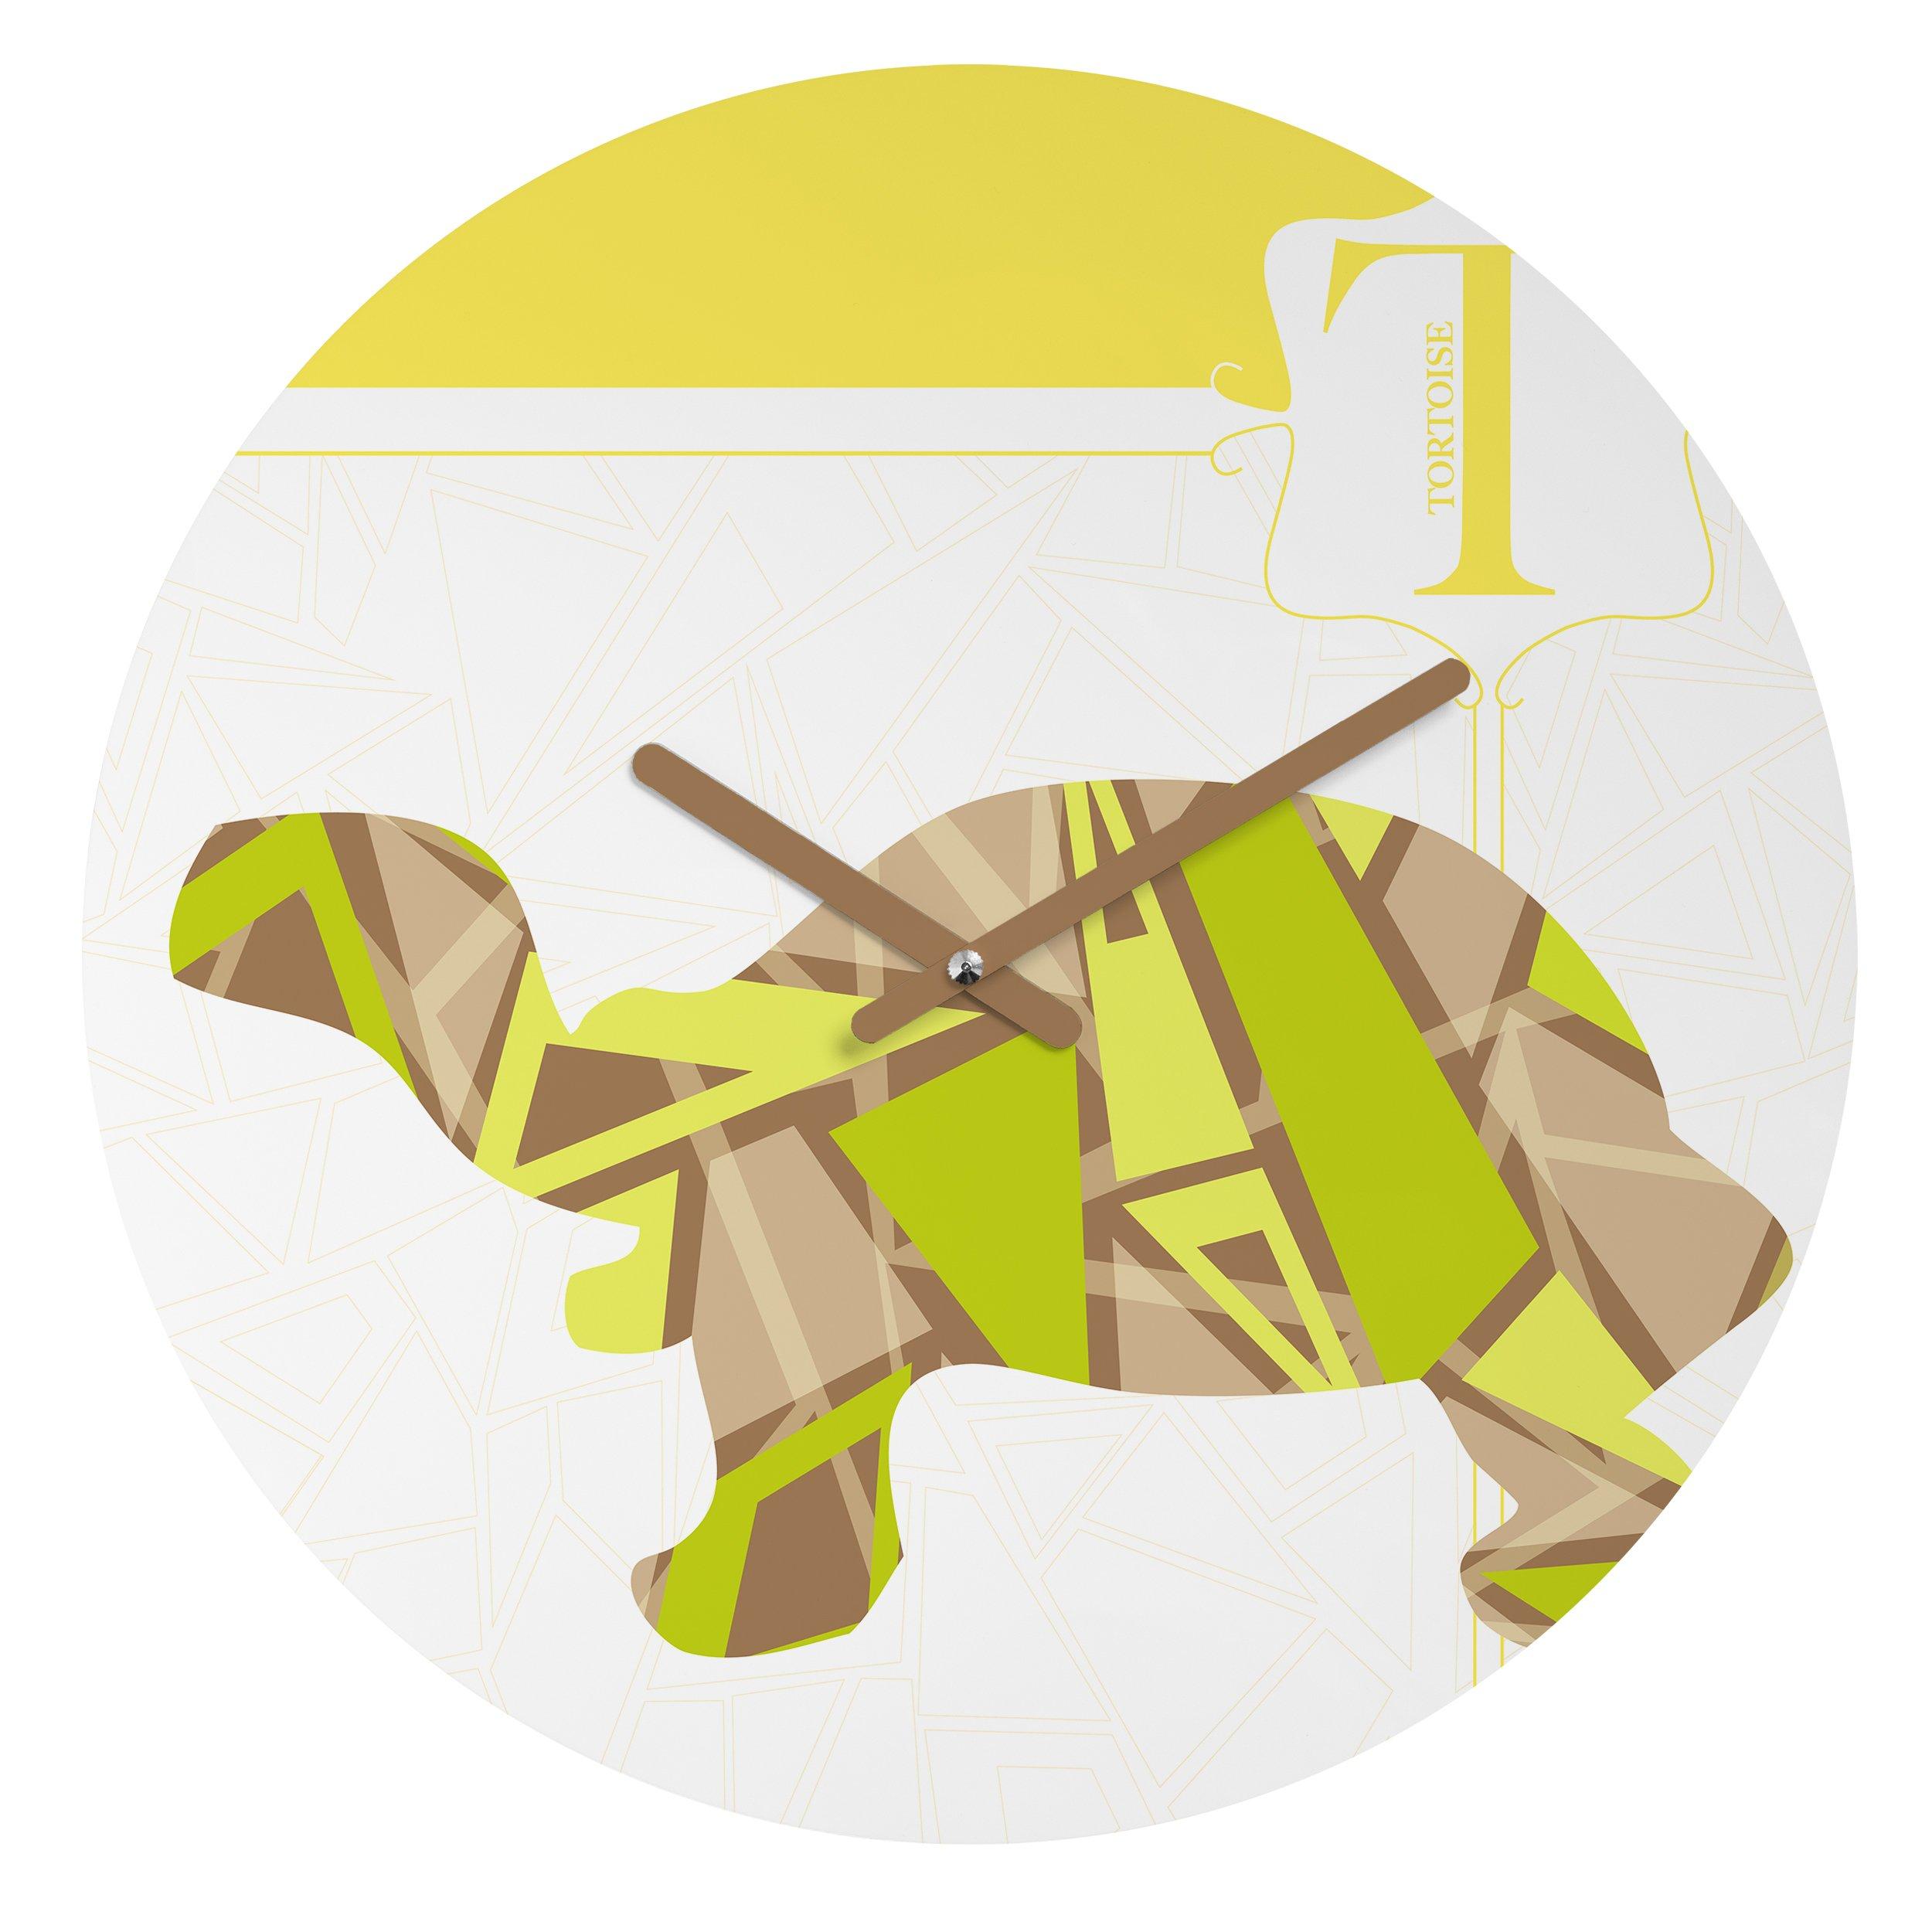 Deny Designs Jennifer Hill, Mister Tortoise, Round Clock, Round, 12'' by Deny Designs